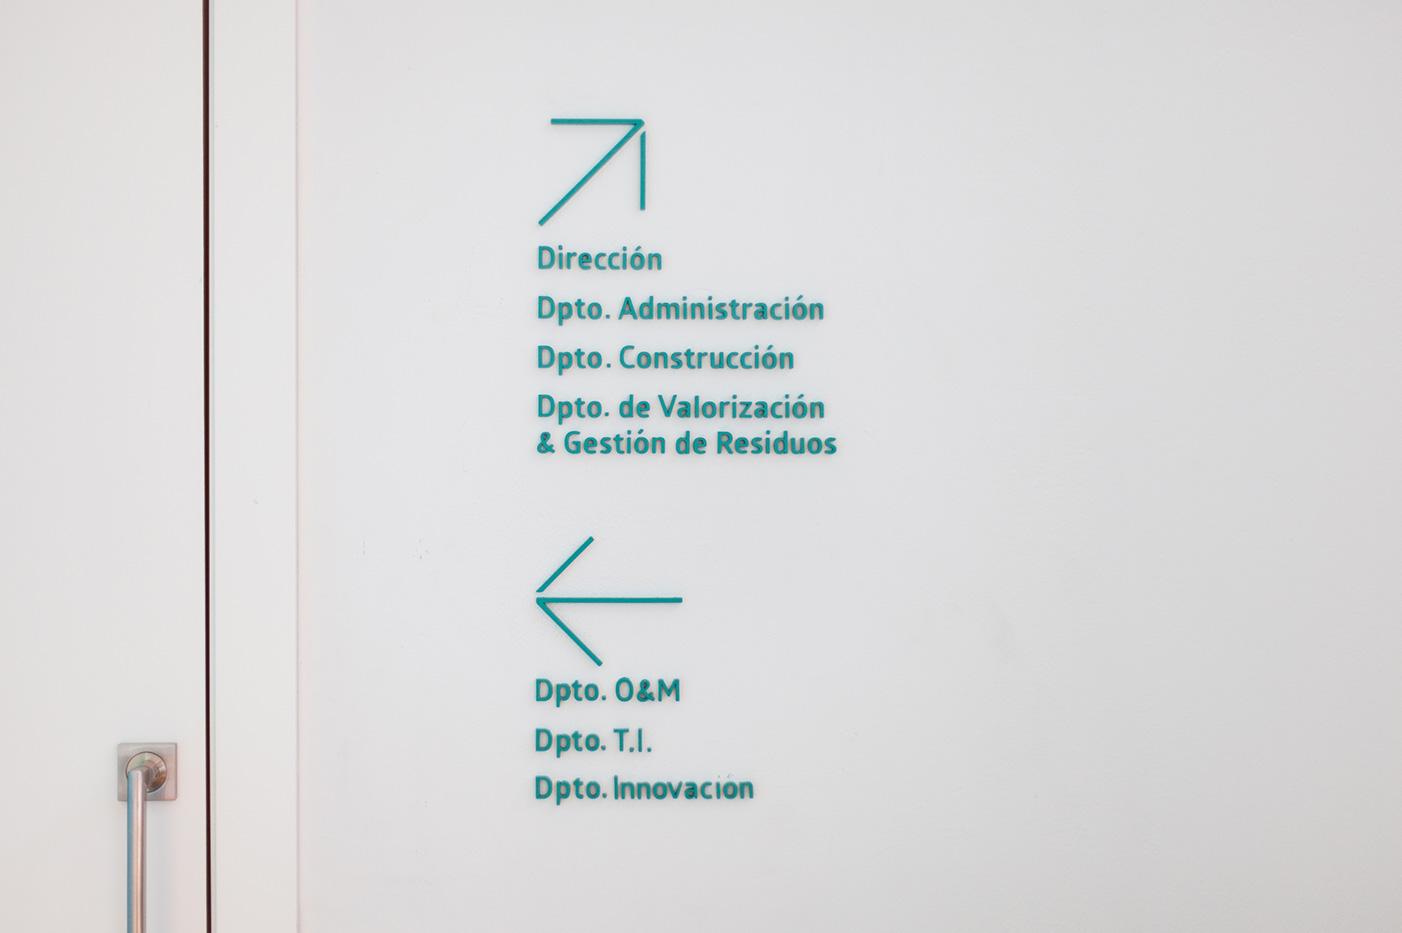 pixelarte-diseno-grafico-valencia-señaletica-empresa-Dam_Depuracion_Aguas_Mediterraneo